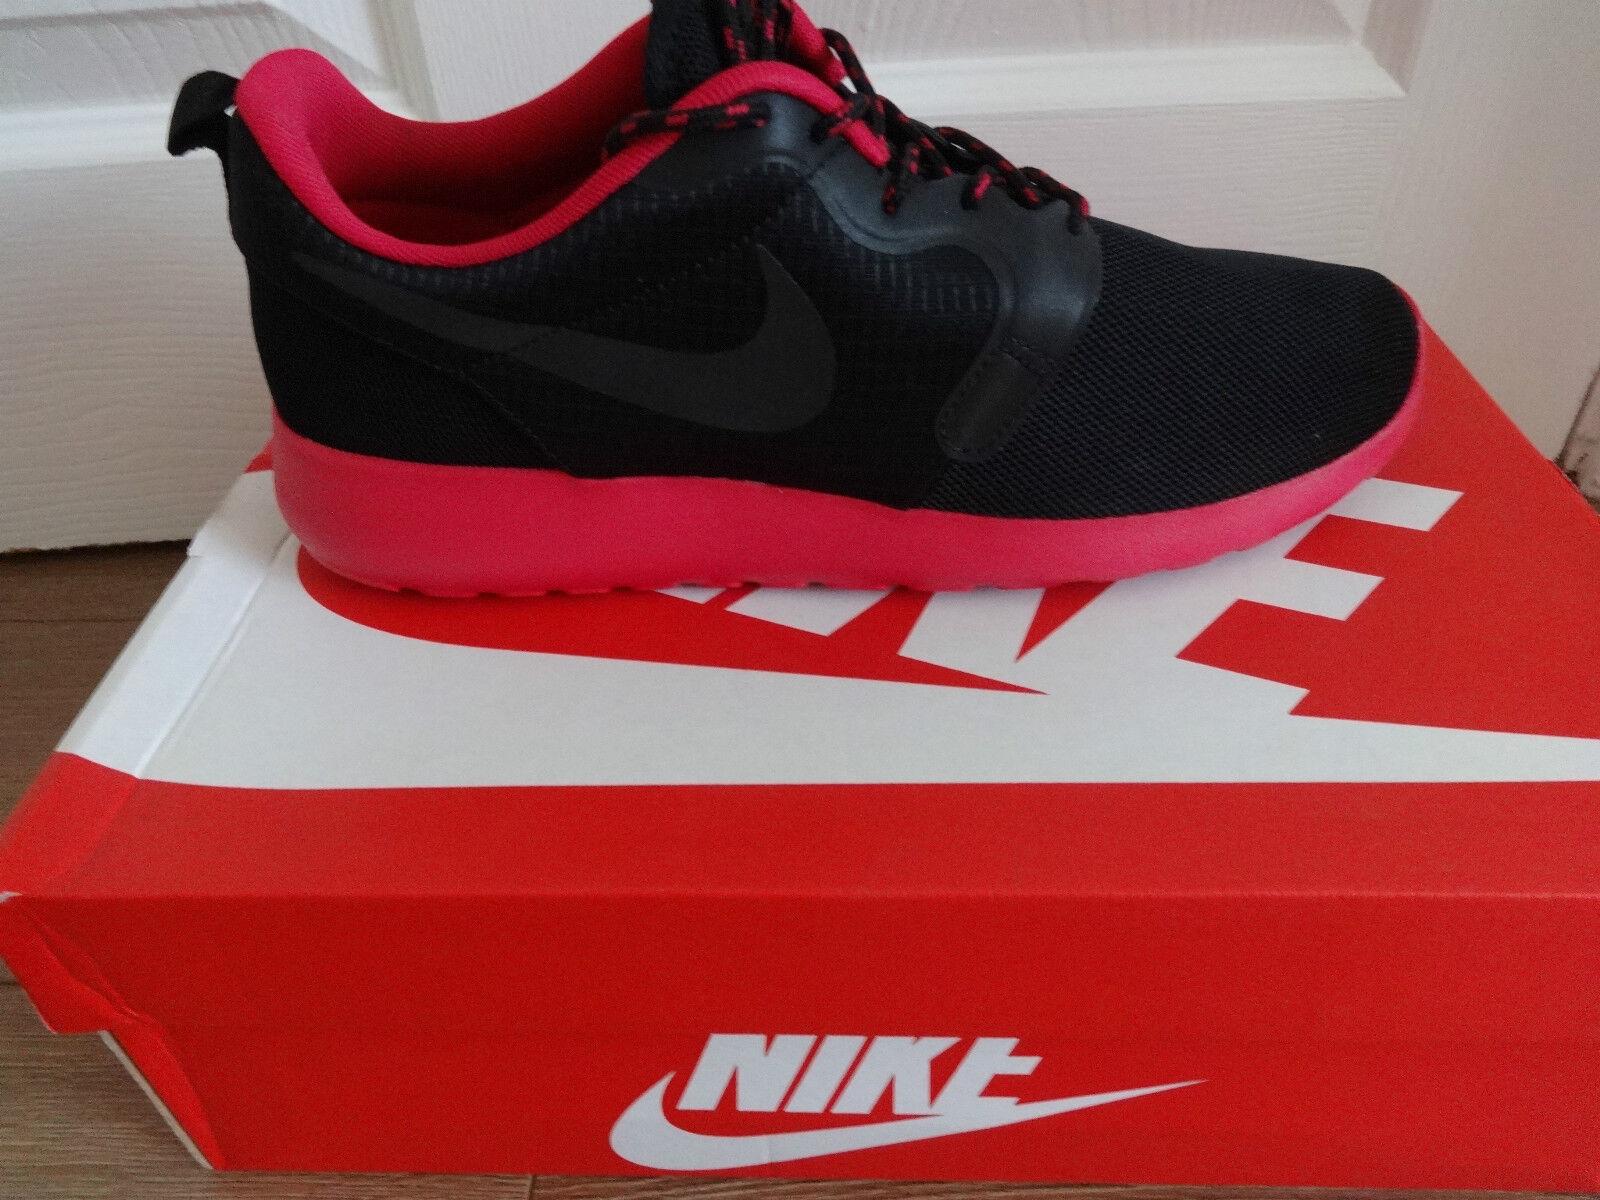 Nike Rosherun HYP trainers baskets 642233 601 noir uk 7.5 eu 42 us 10 new+box.